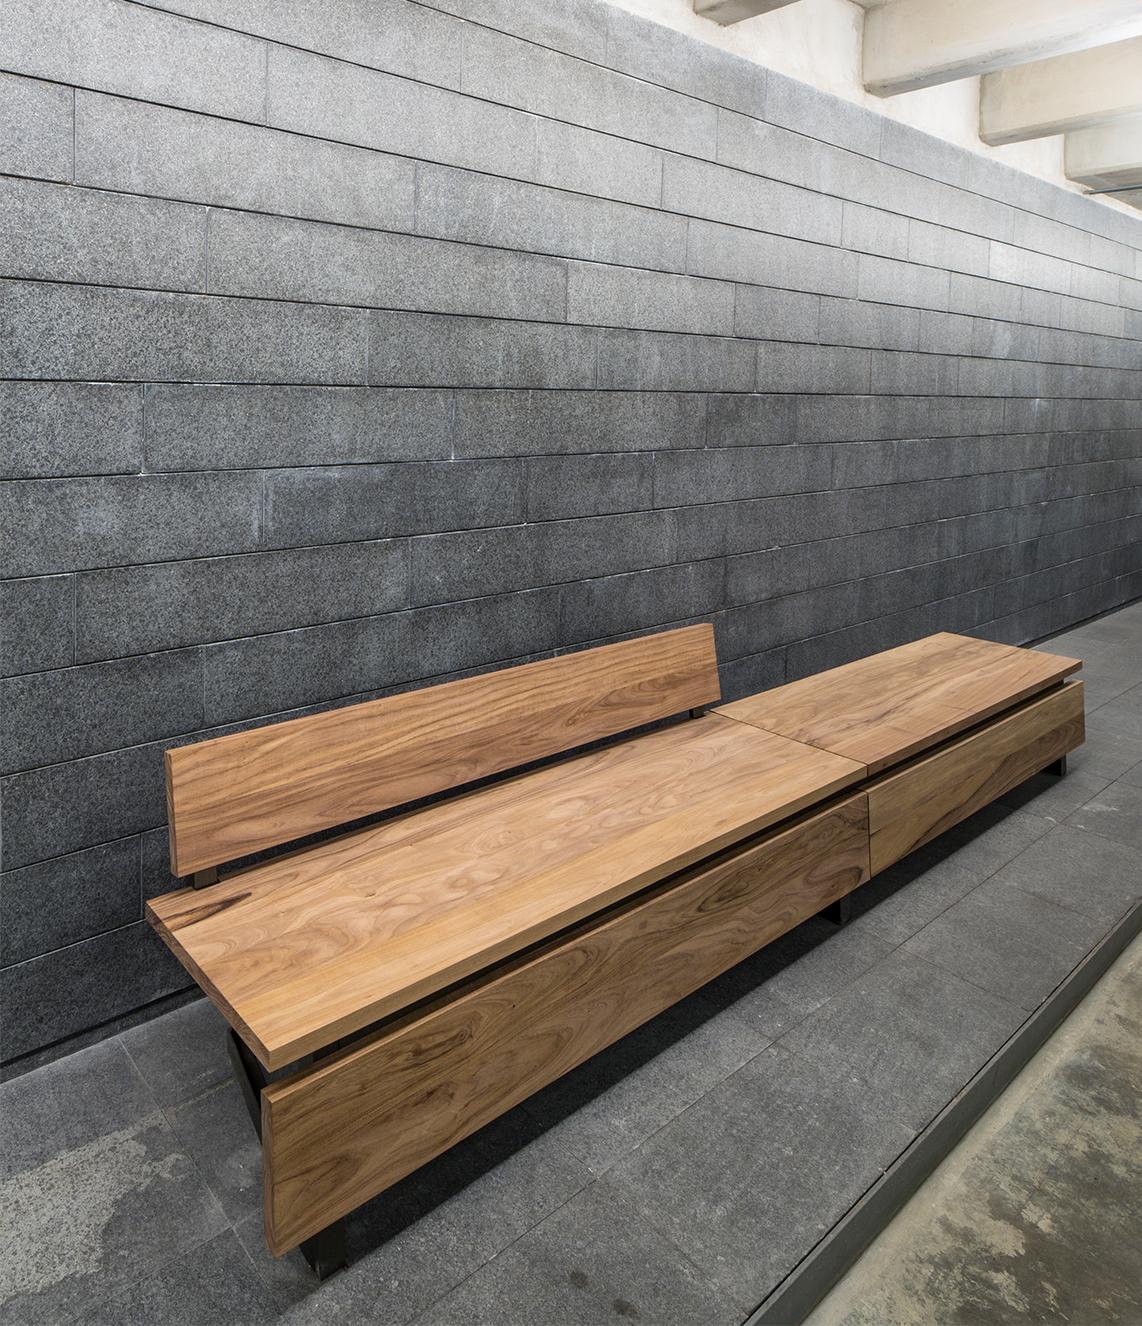 Levo Bench